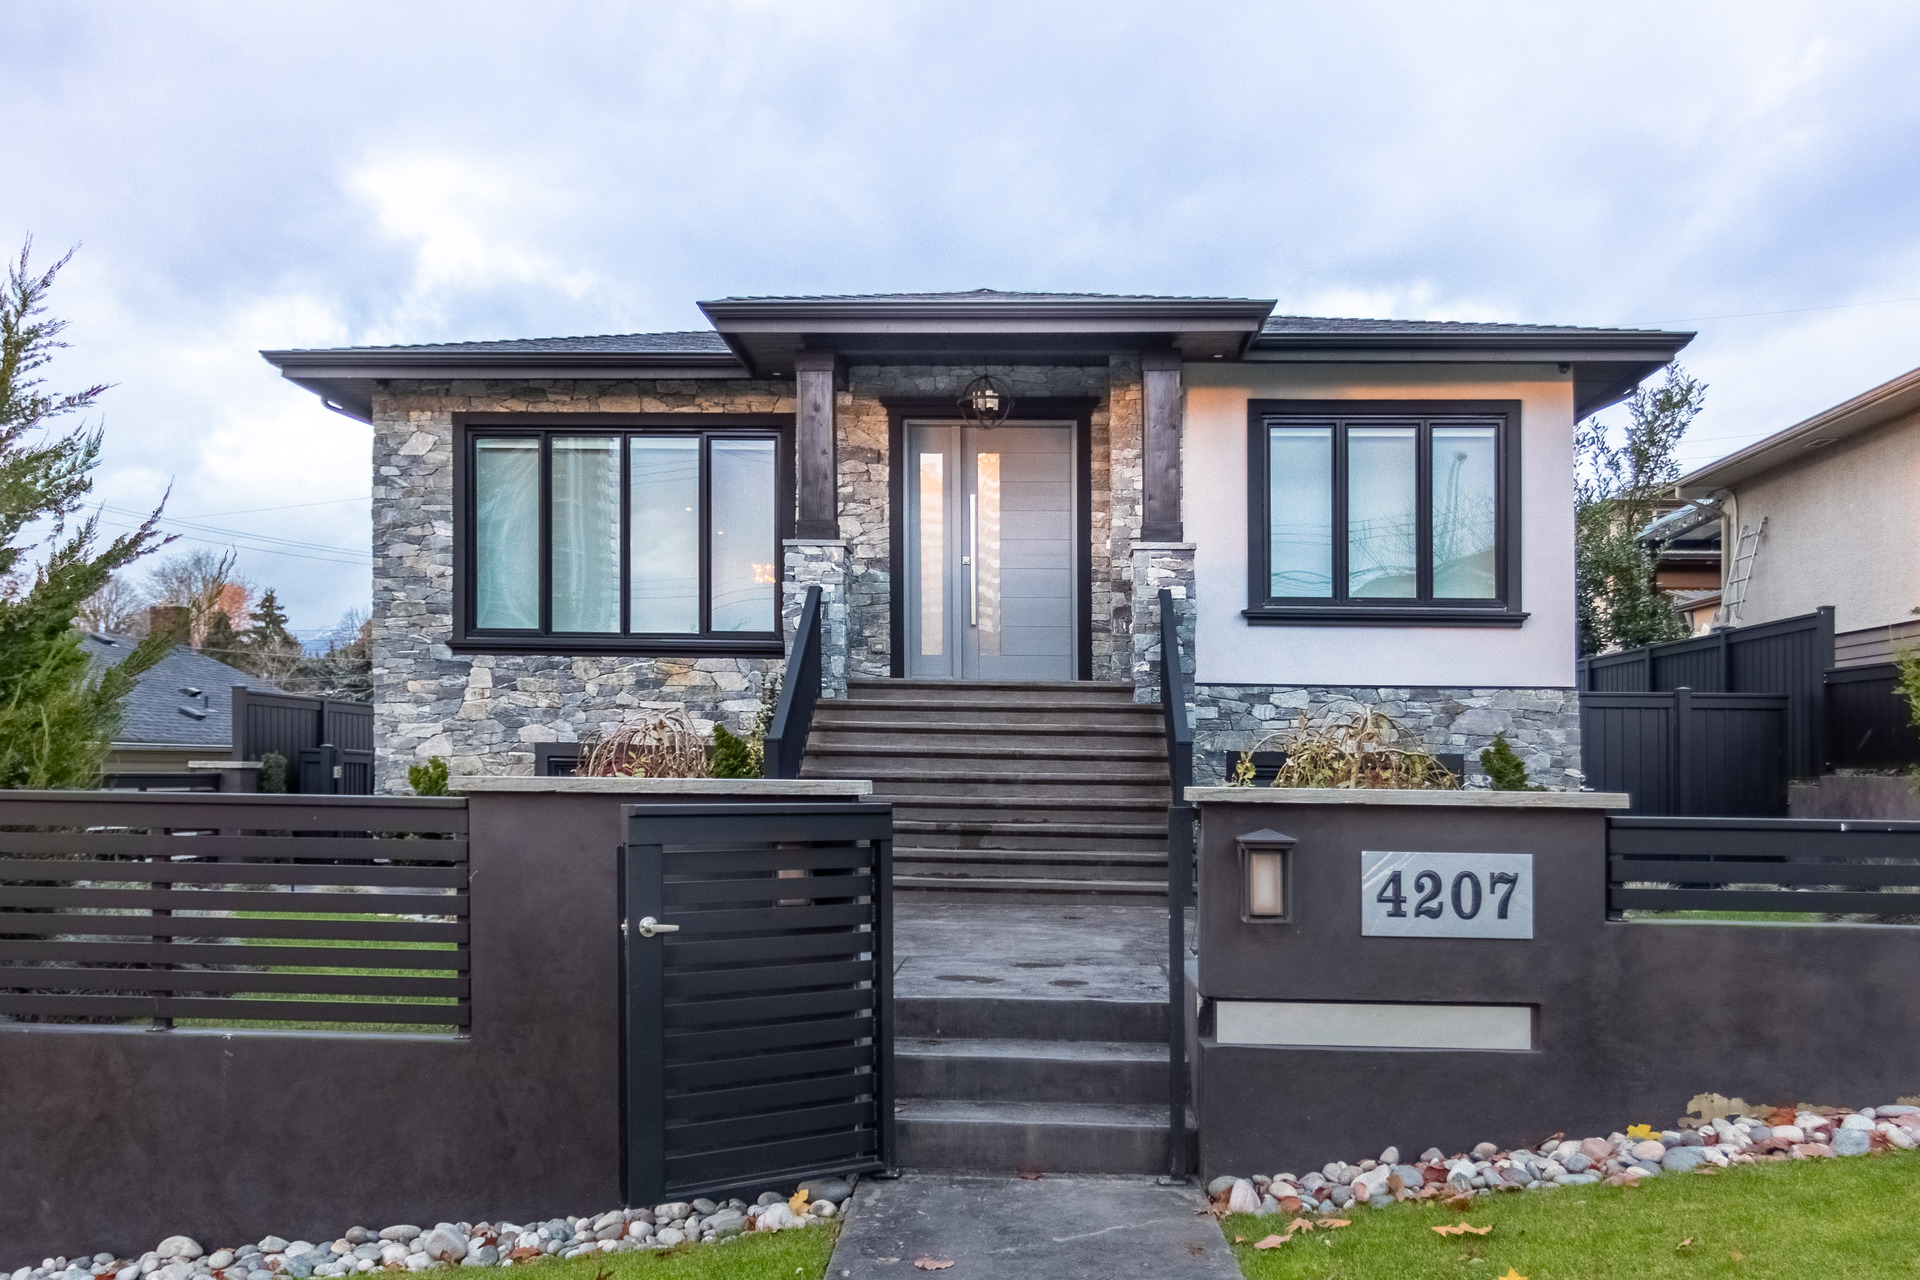 4207 Graveley Street, Willingdon Heights, Burnaby North